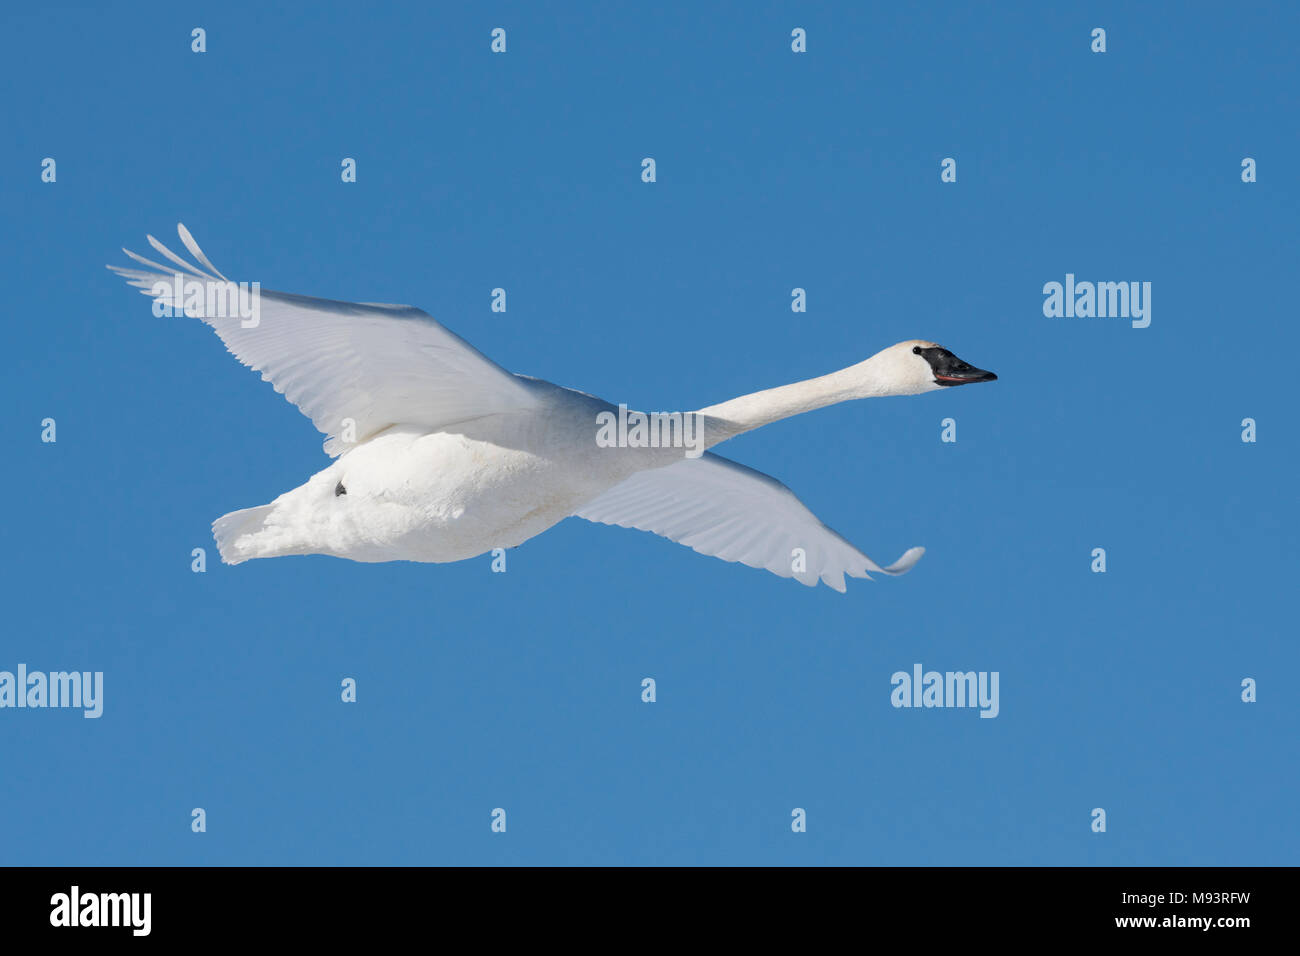 Trumpeter swan (Cygnus buccinator) in flight, WI, USA, Early January, by Dominique Braud/Dembinsky Photo Assoc Stock Photo